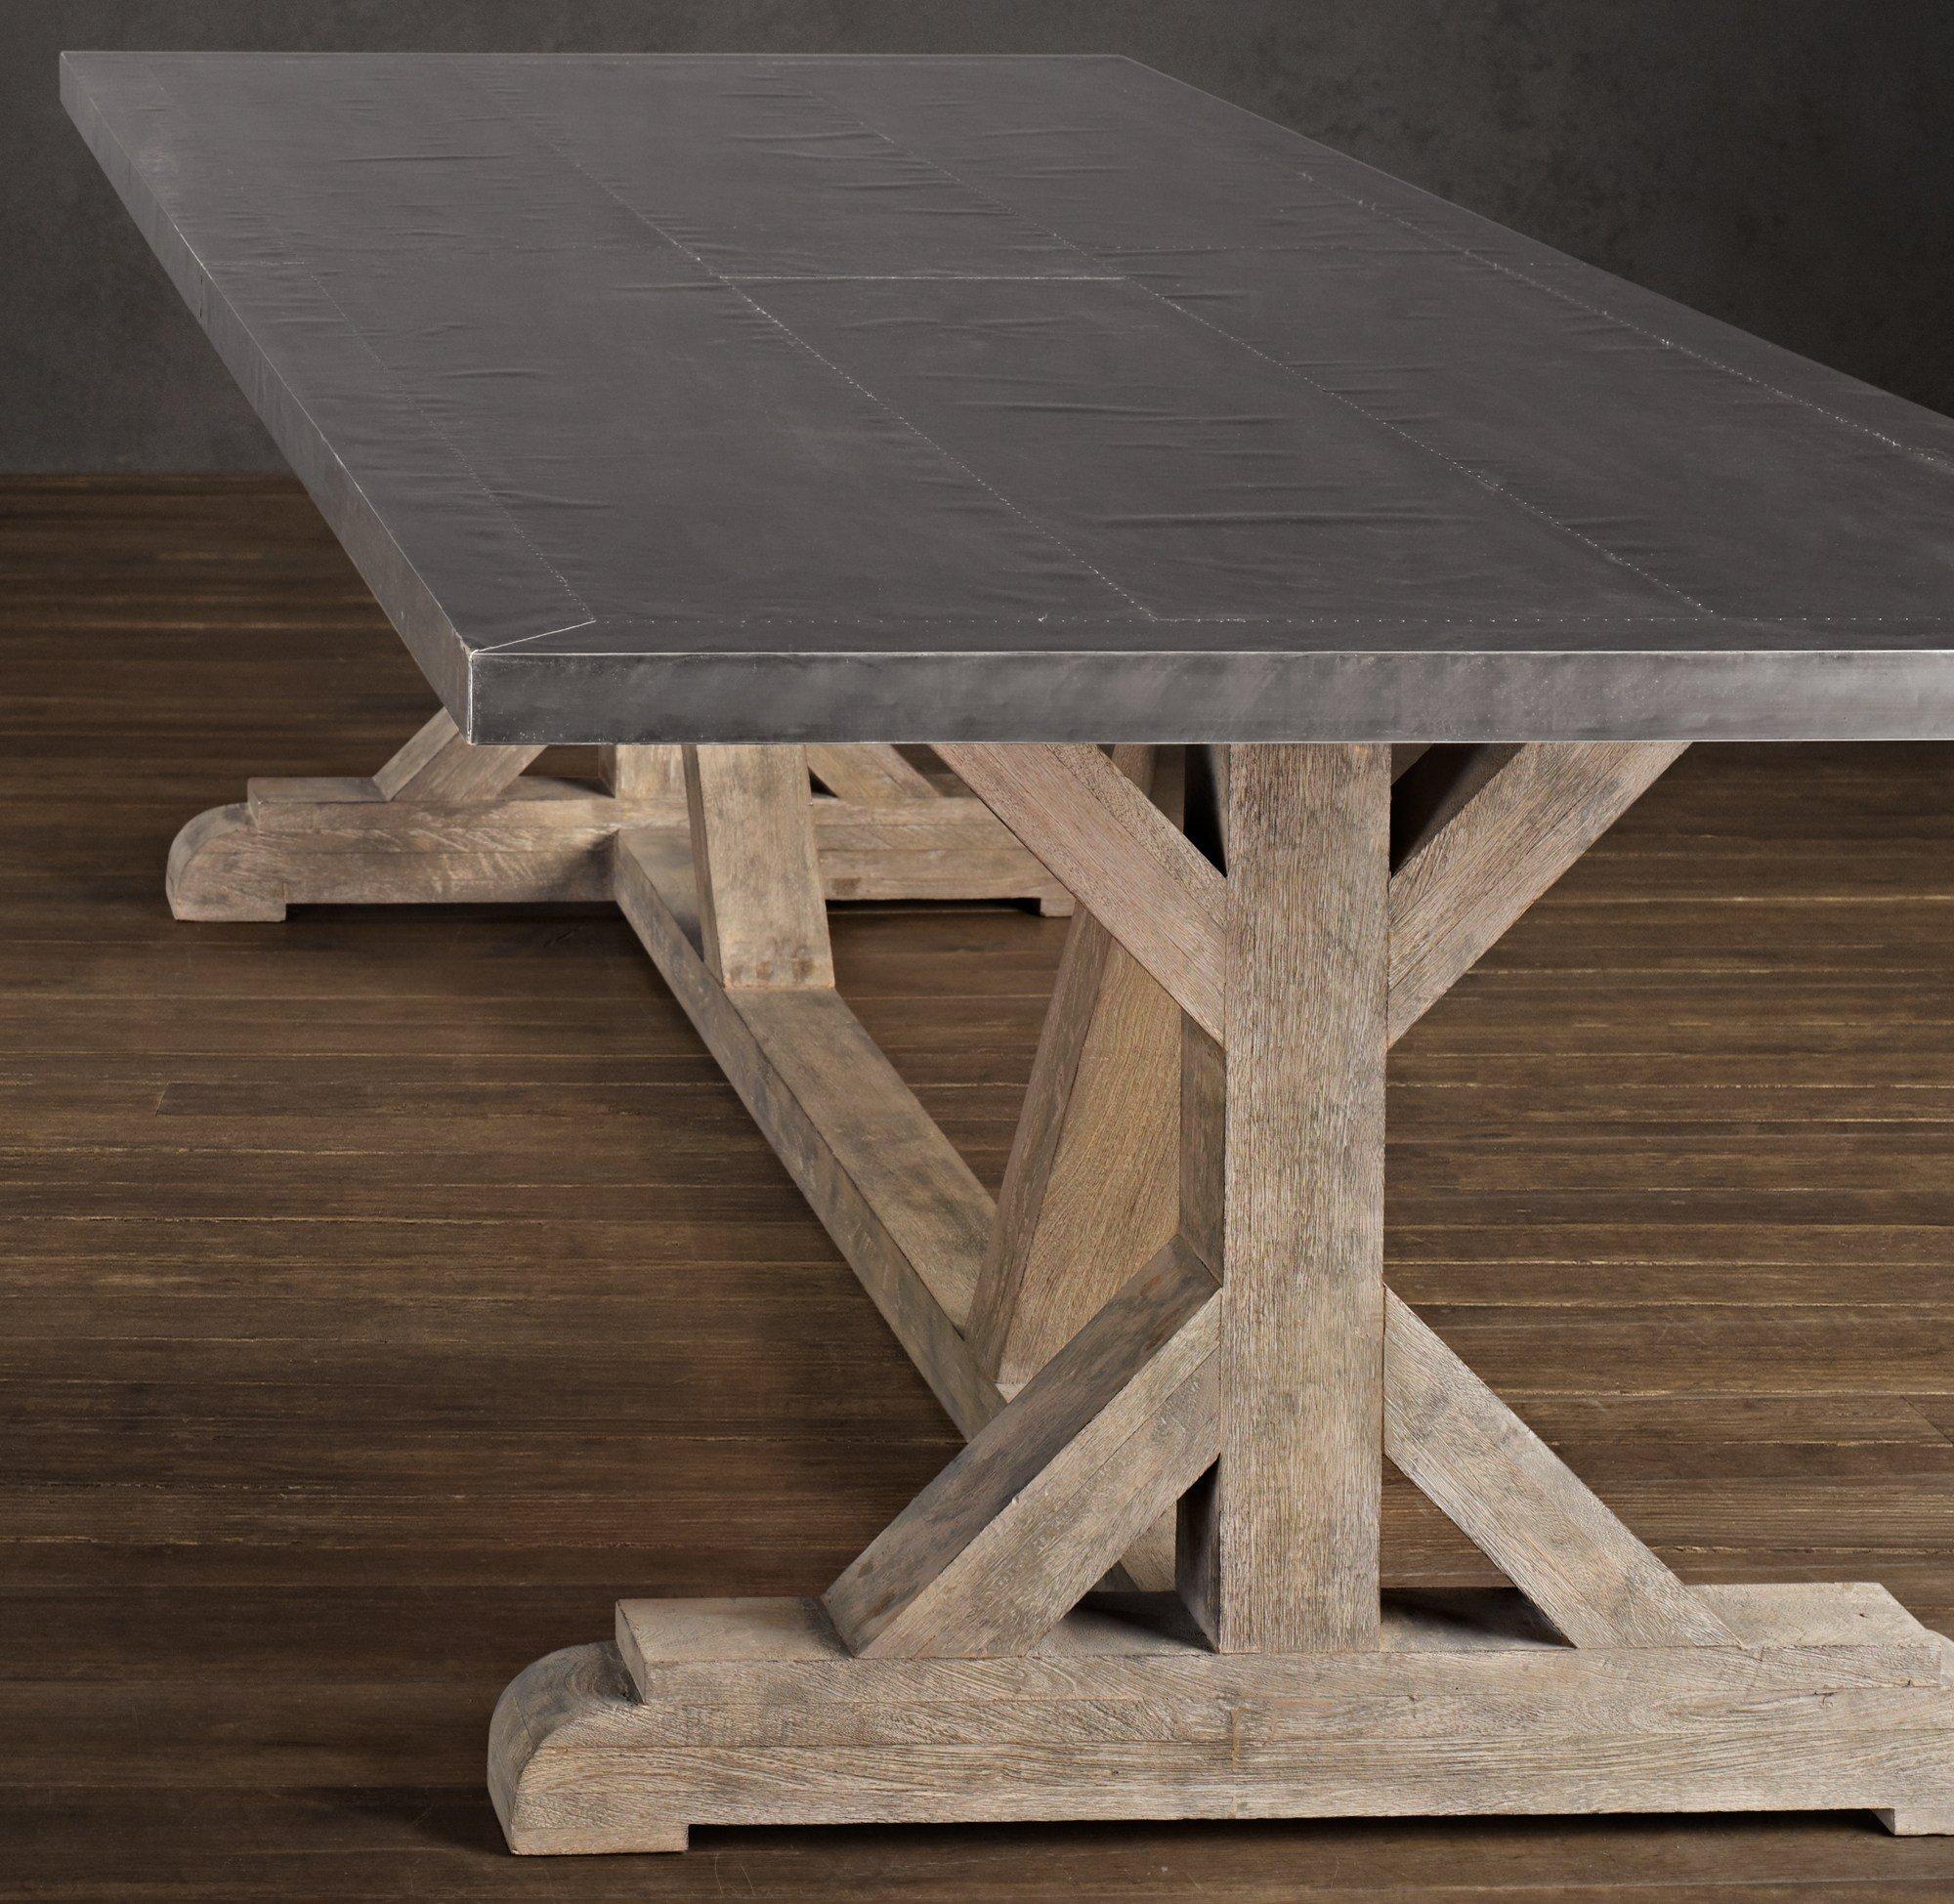 Target Restoration Hardware announce furniture recalls  : 13132392G from www.ksby.com size 2000 x 1949 jpeg 715kB